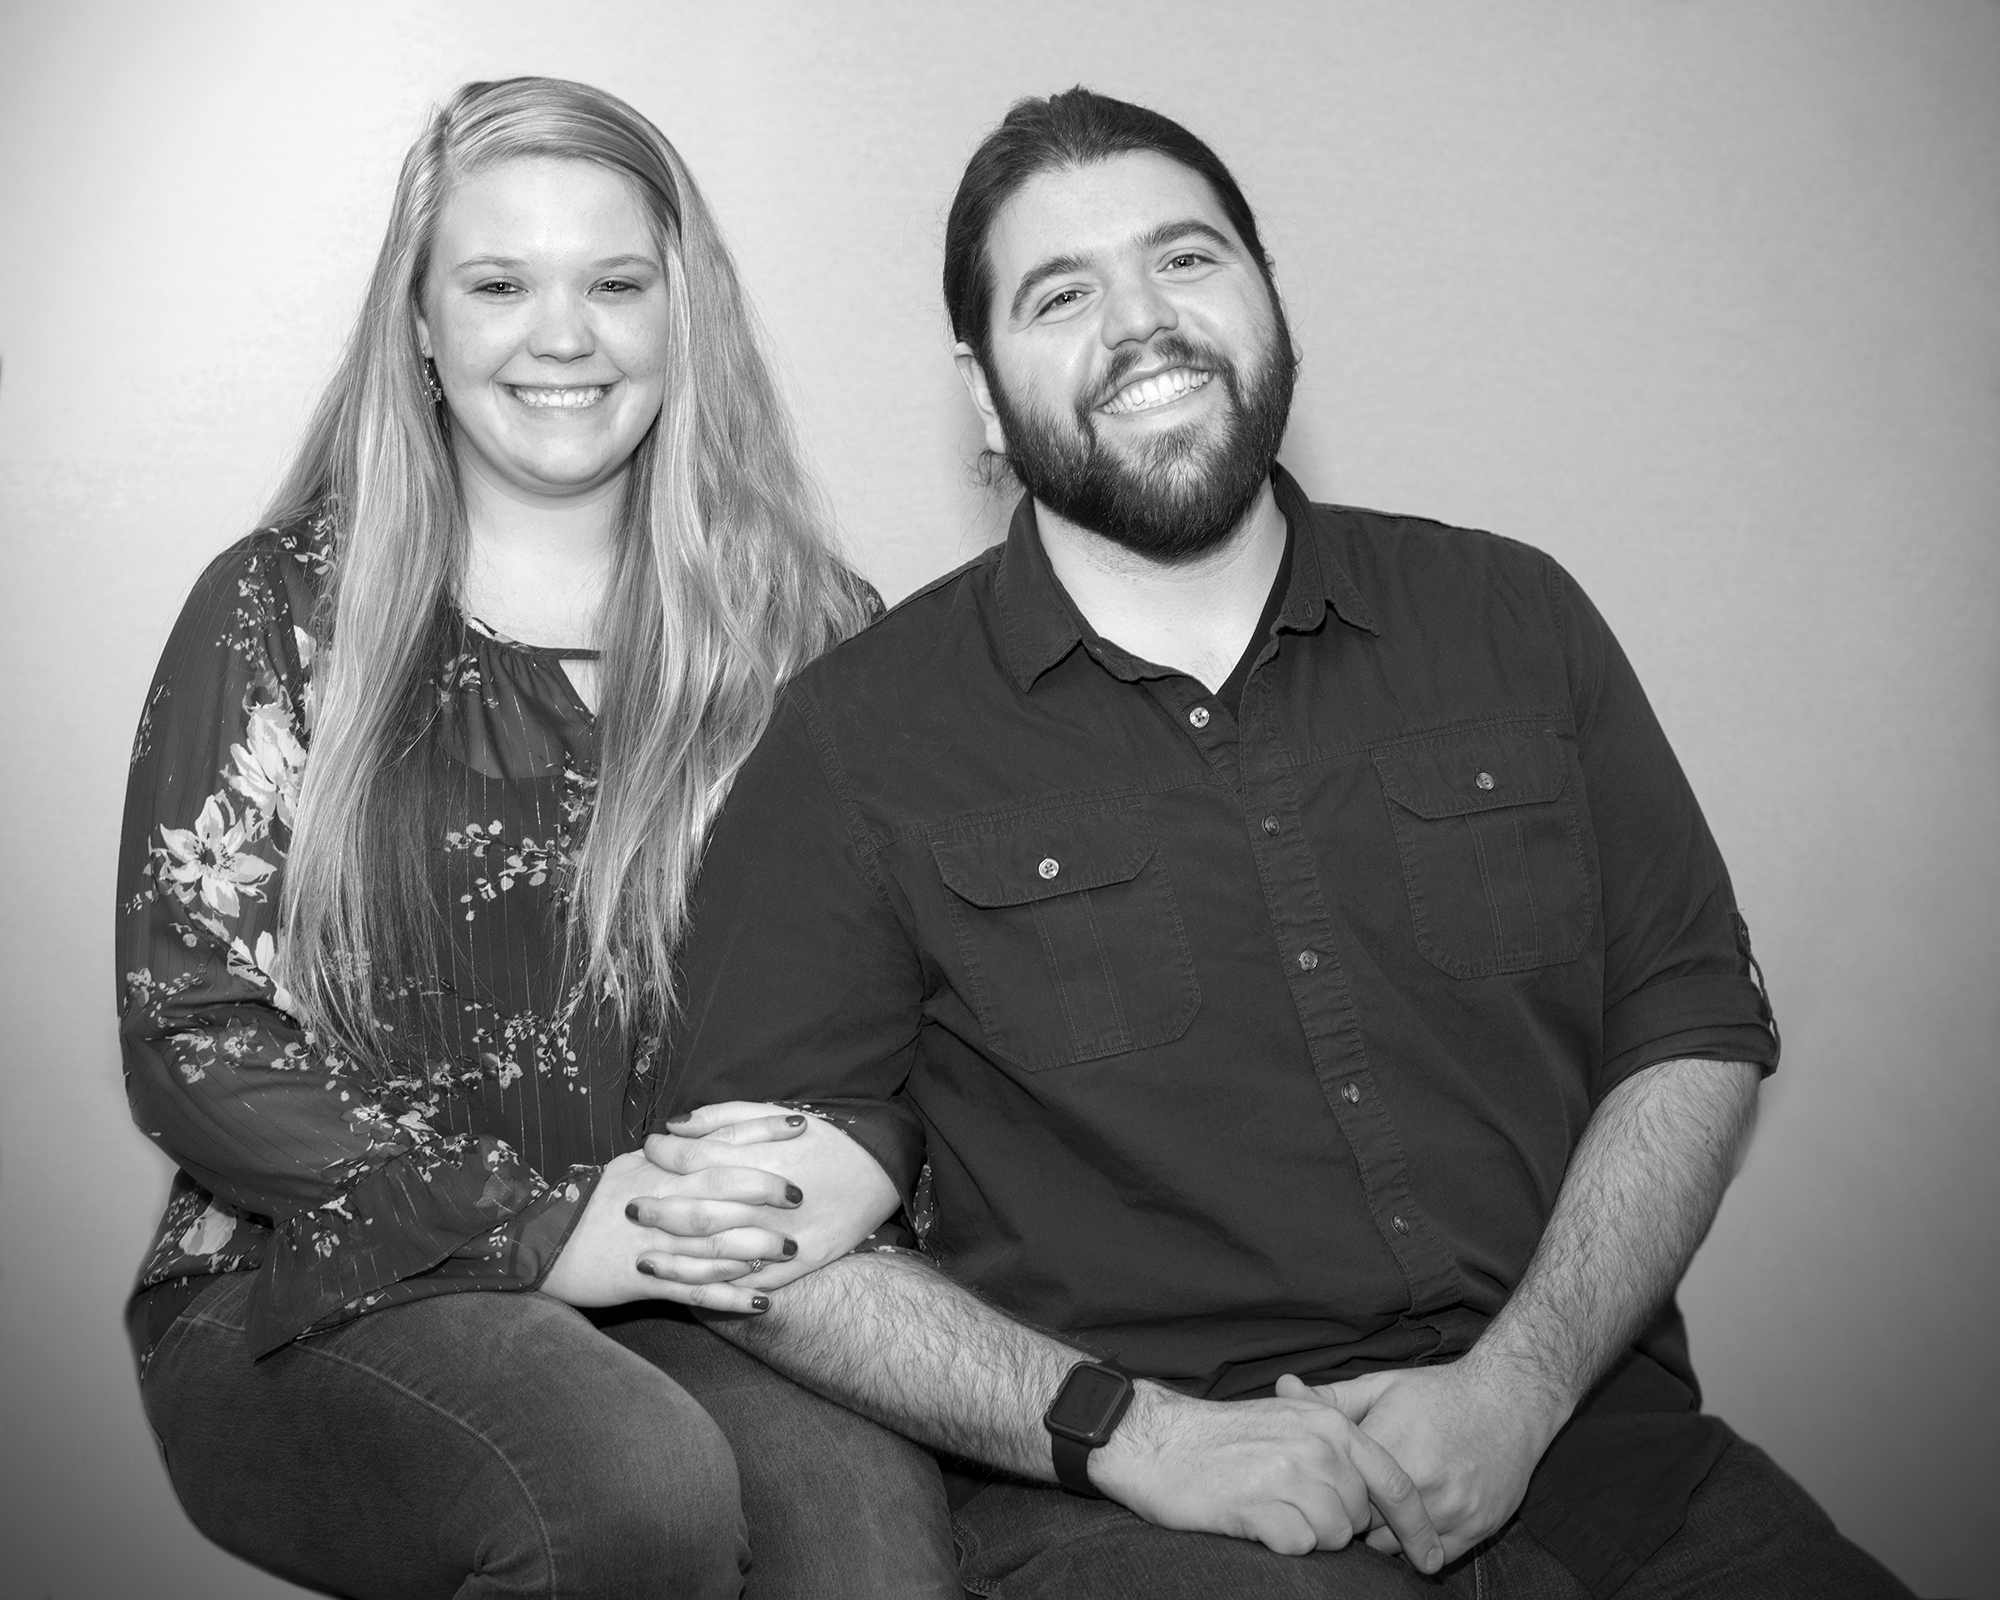 David and Sarah Loomis